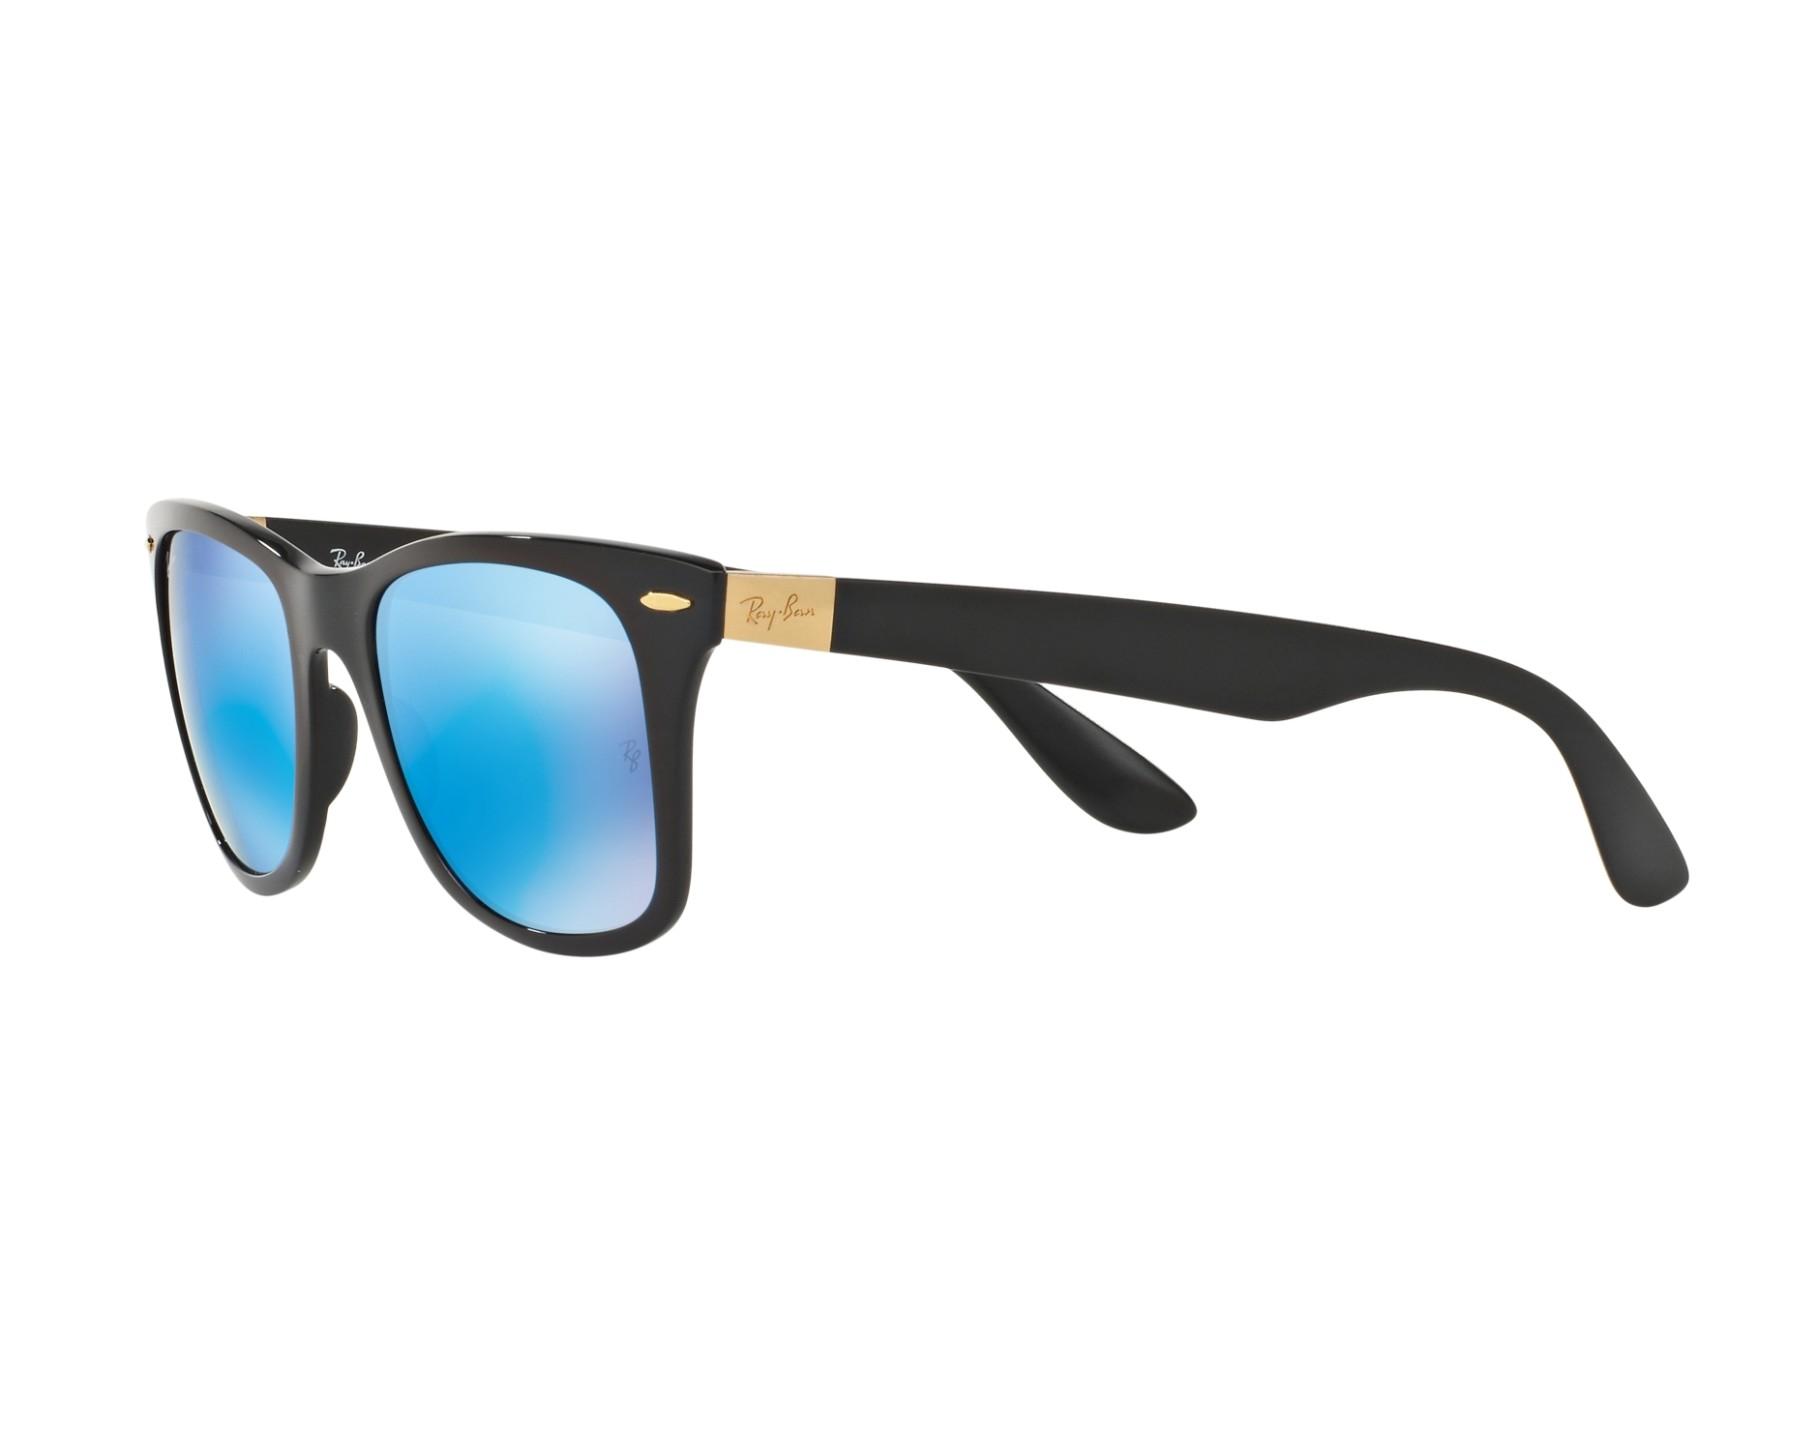 20593f42097 Sunglasses Ray-Ban RB-4195 631855 52-20 Black 360 degree view 3